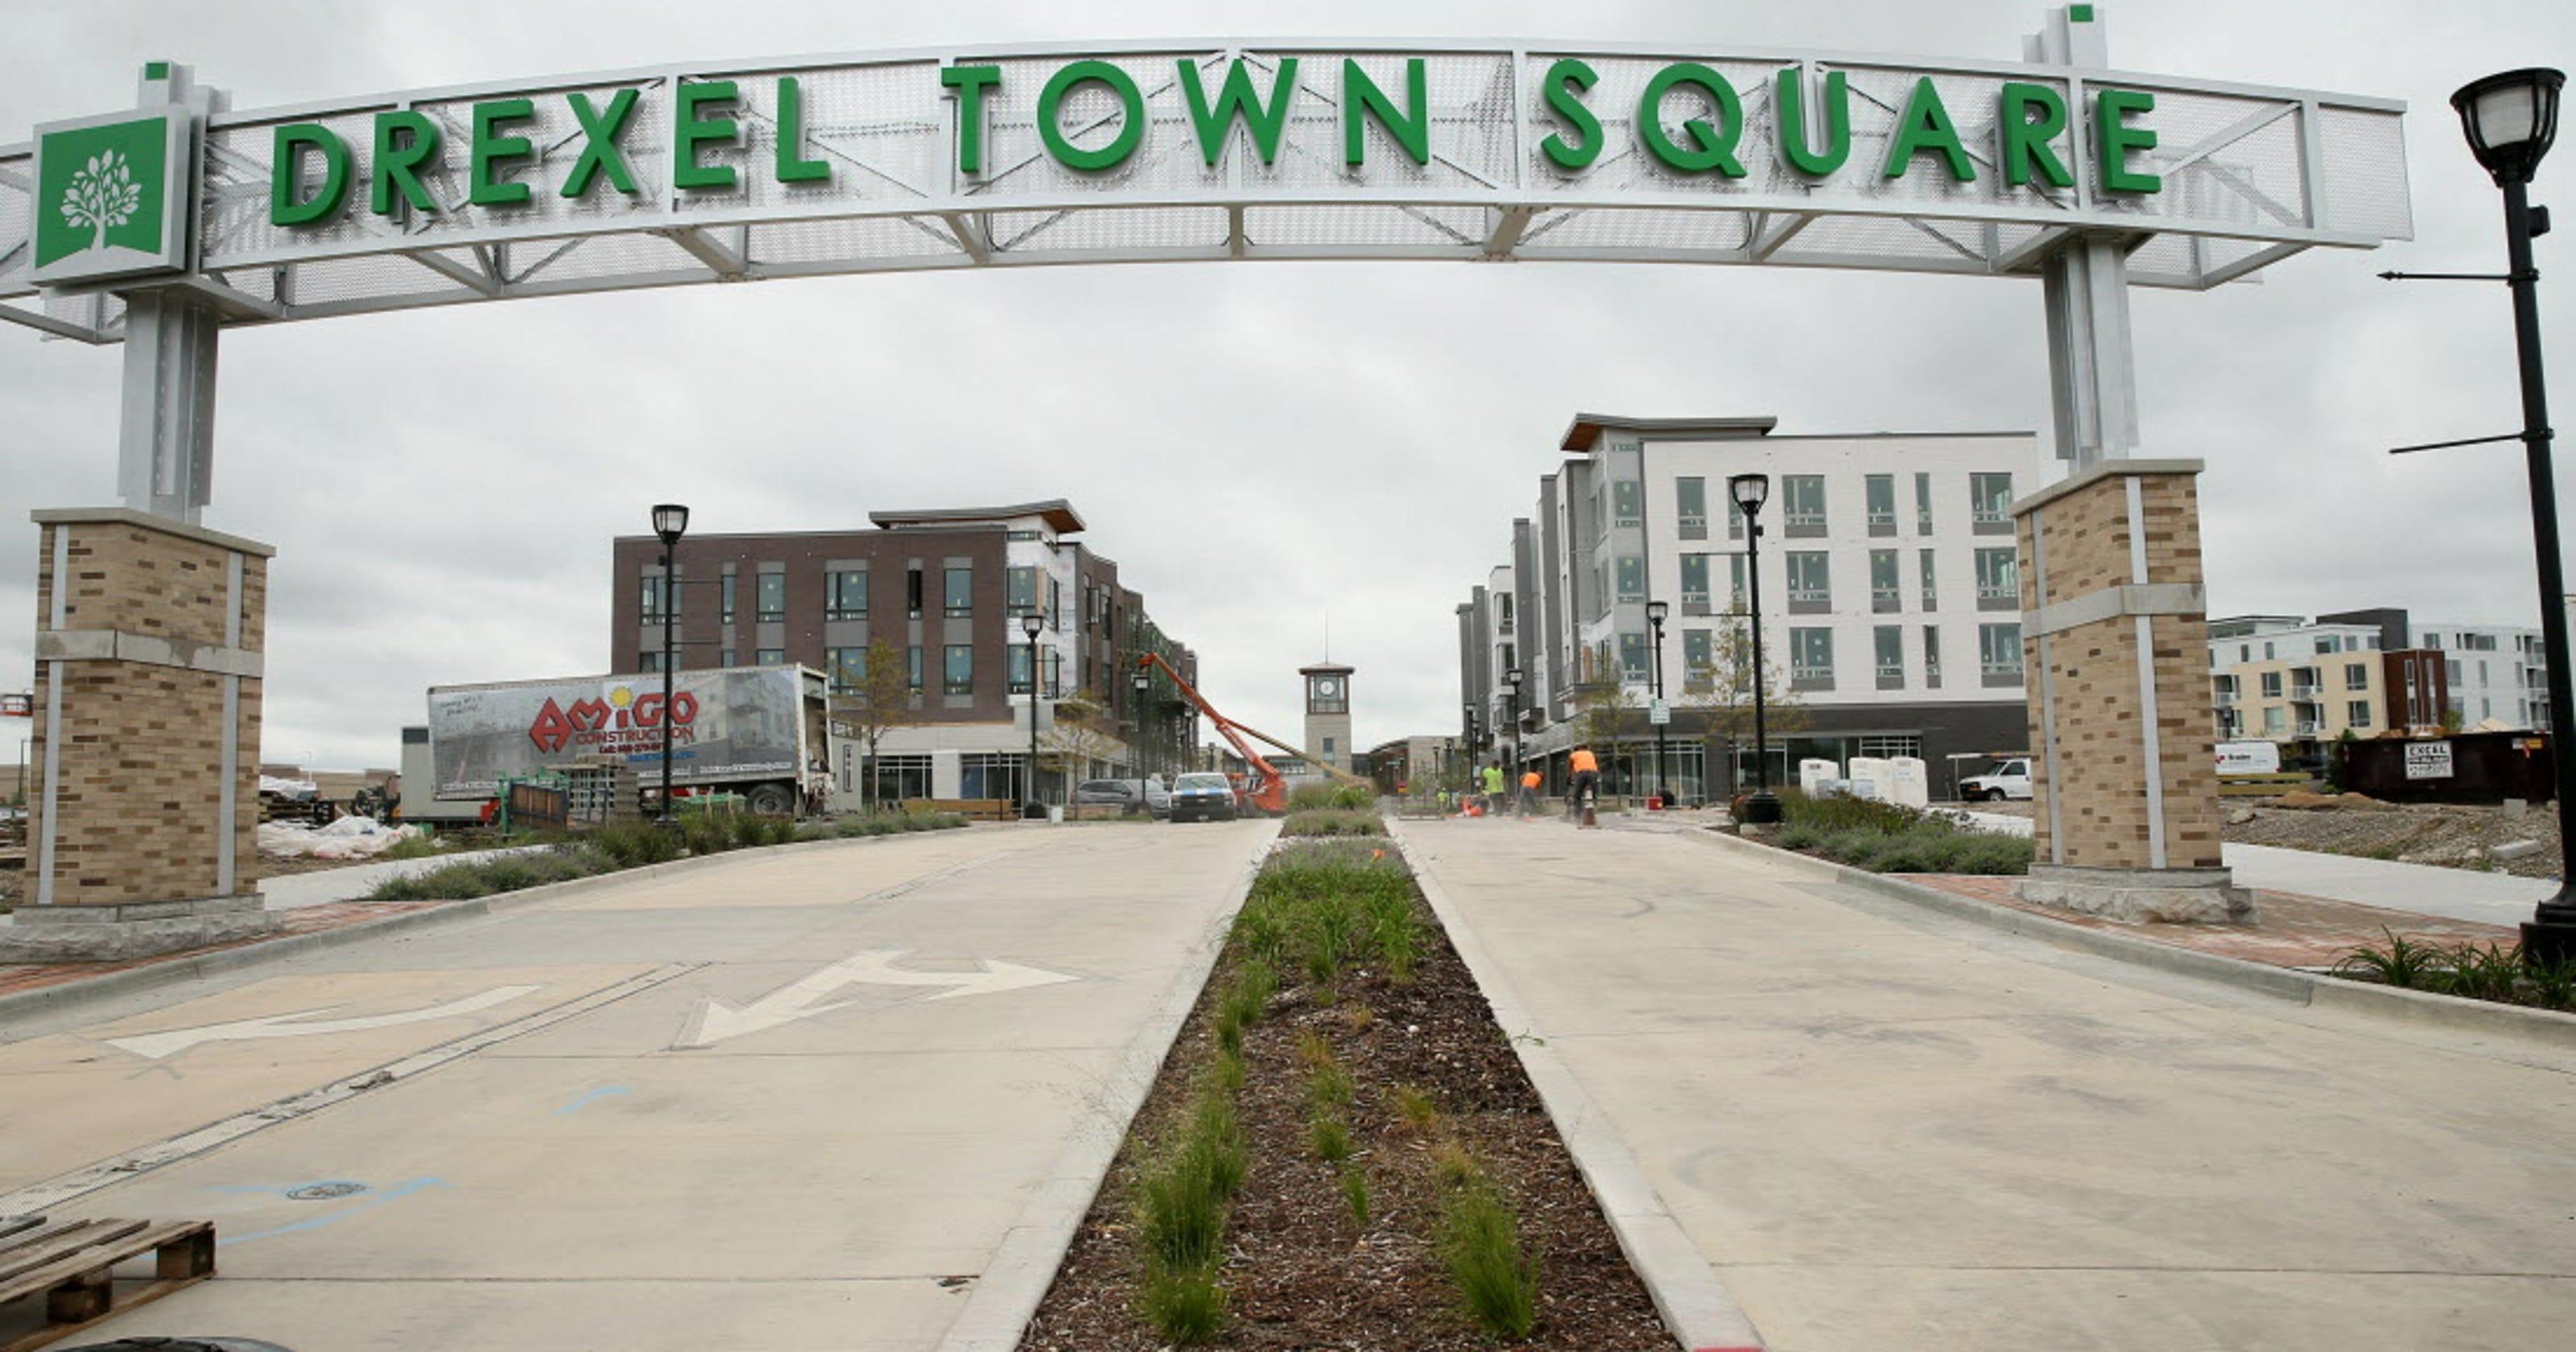 Drexel Town Square continues Oak Creek growth